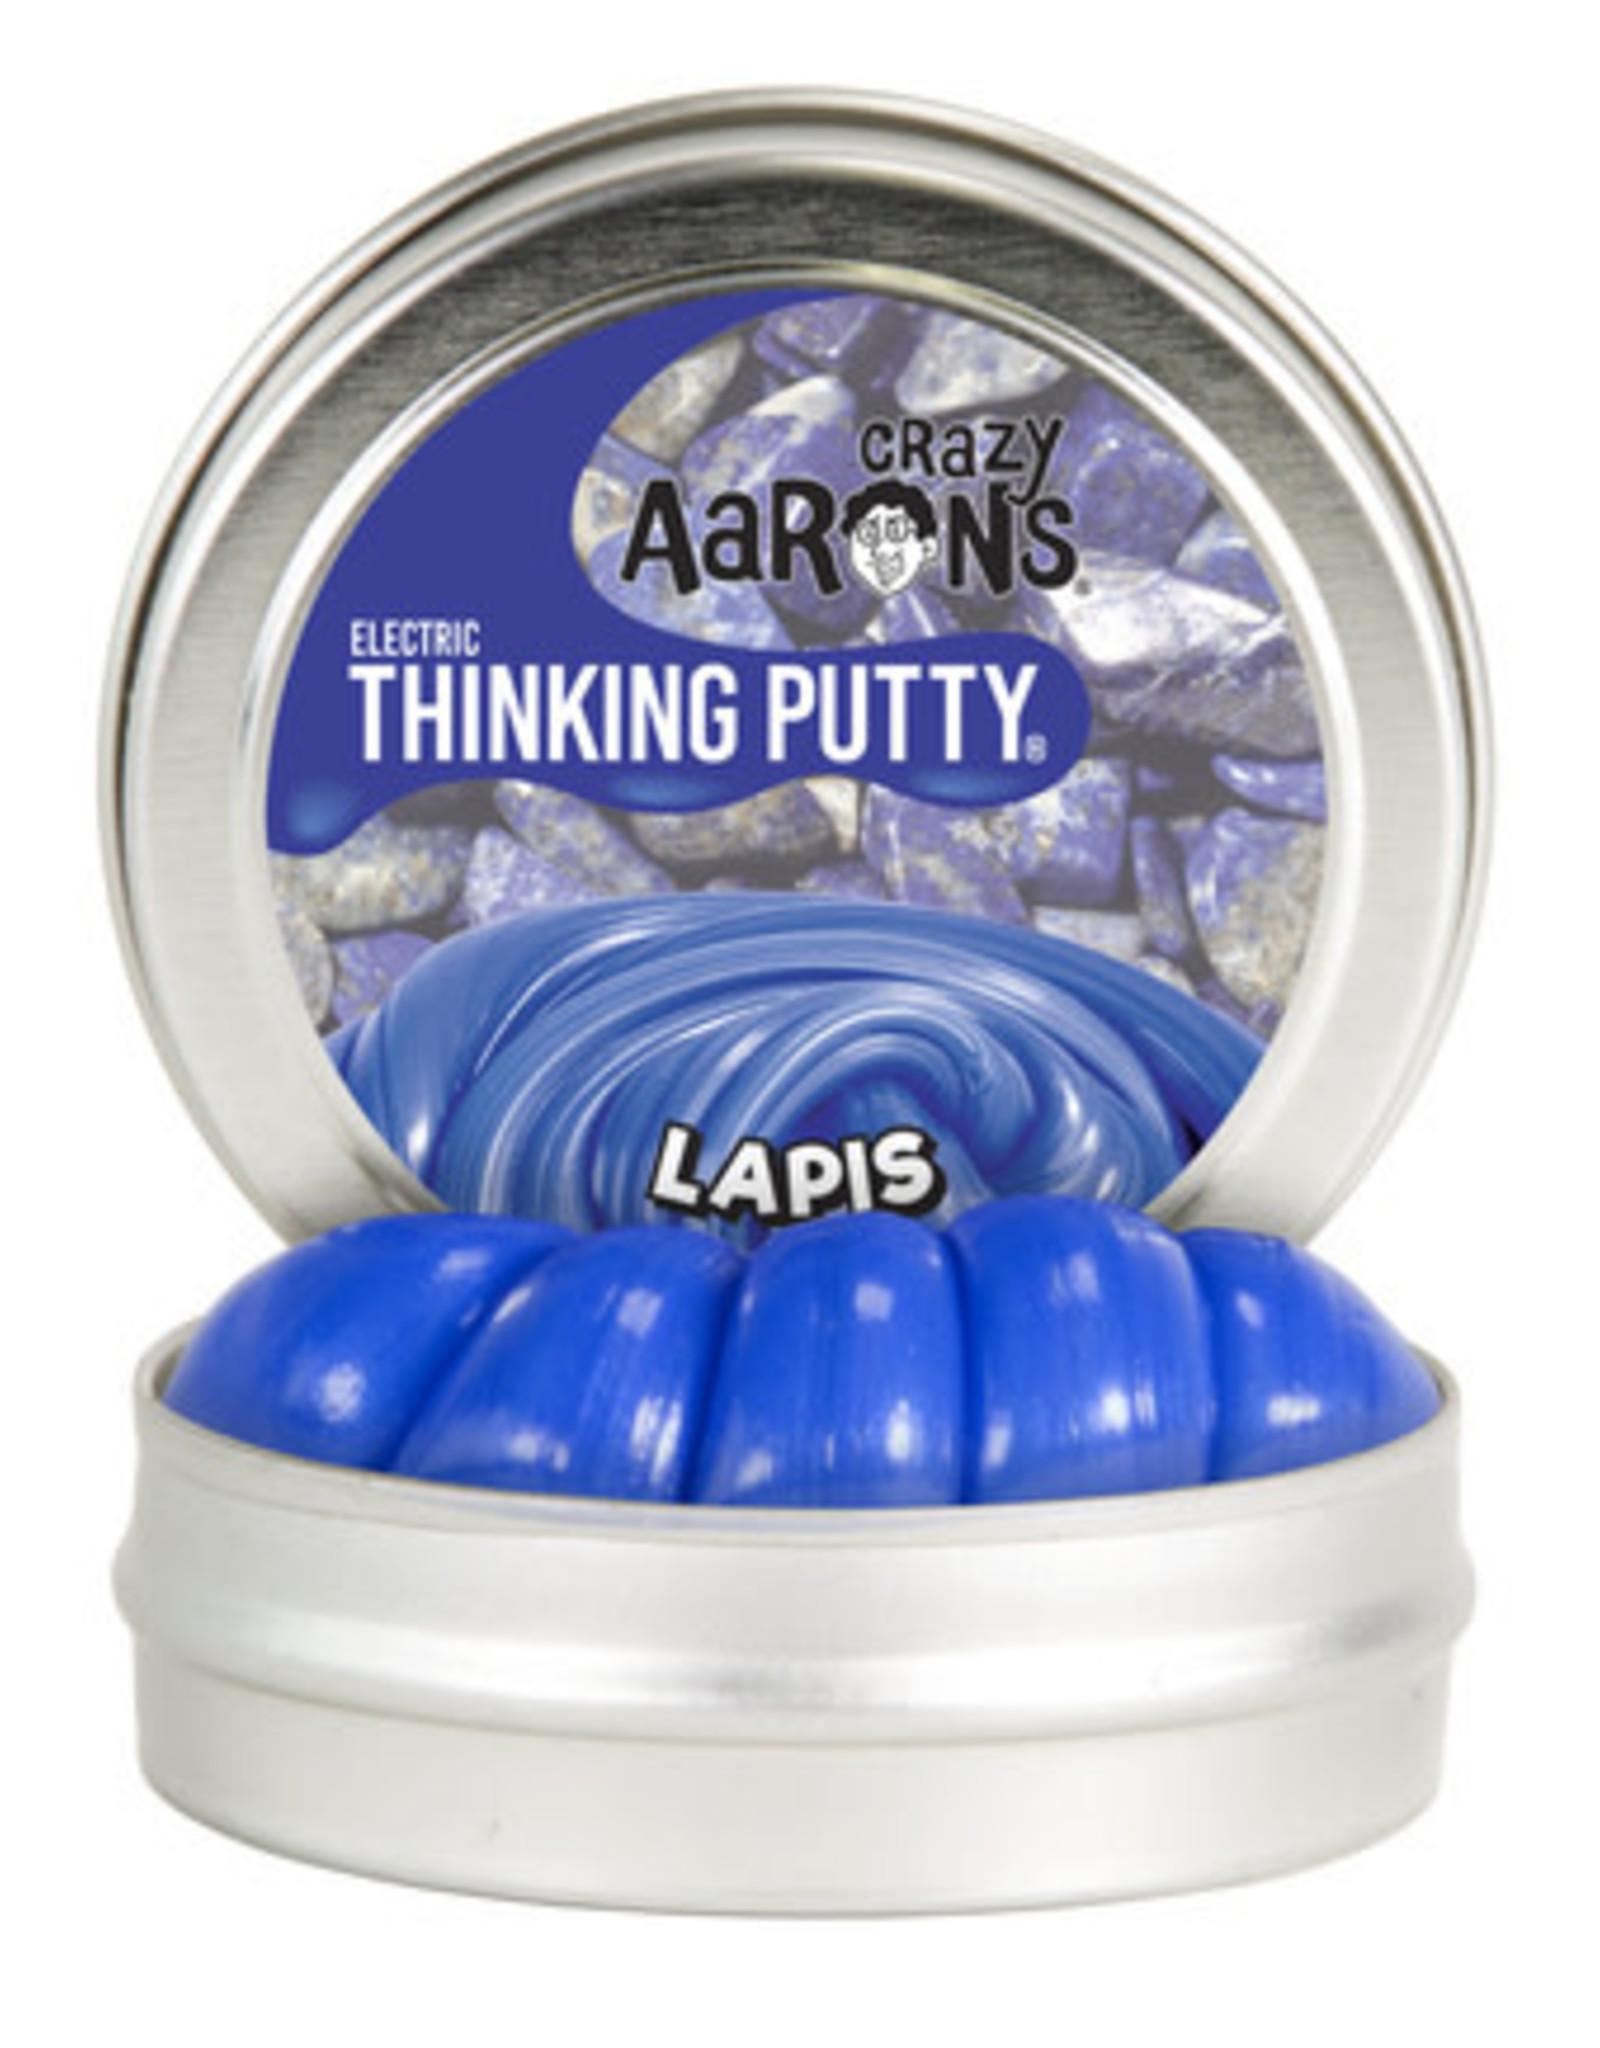 Crazy Aaron's Thinking Putty Small Tin - Lapis